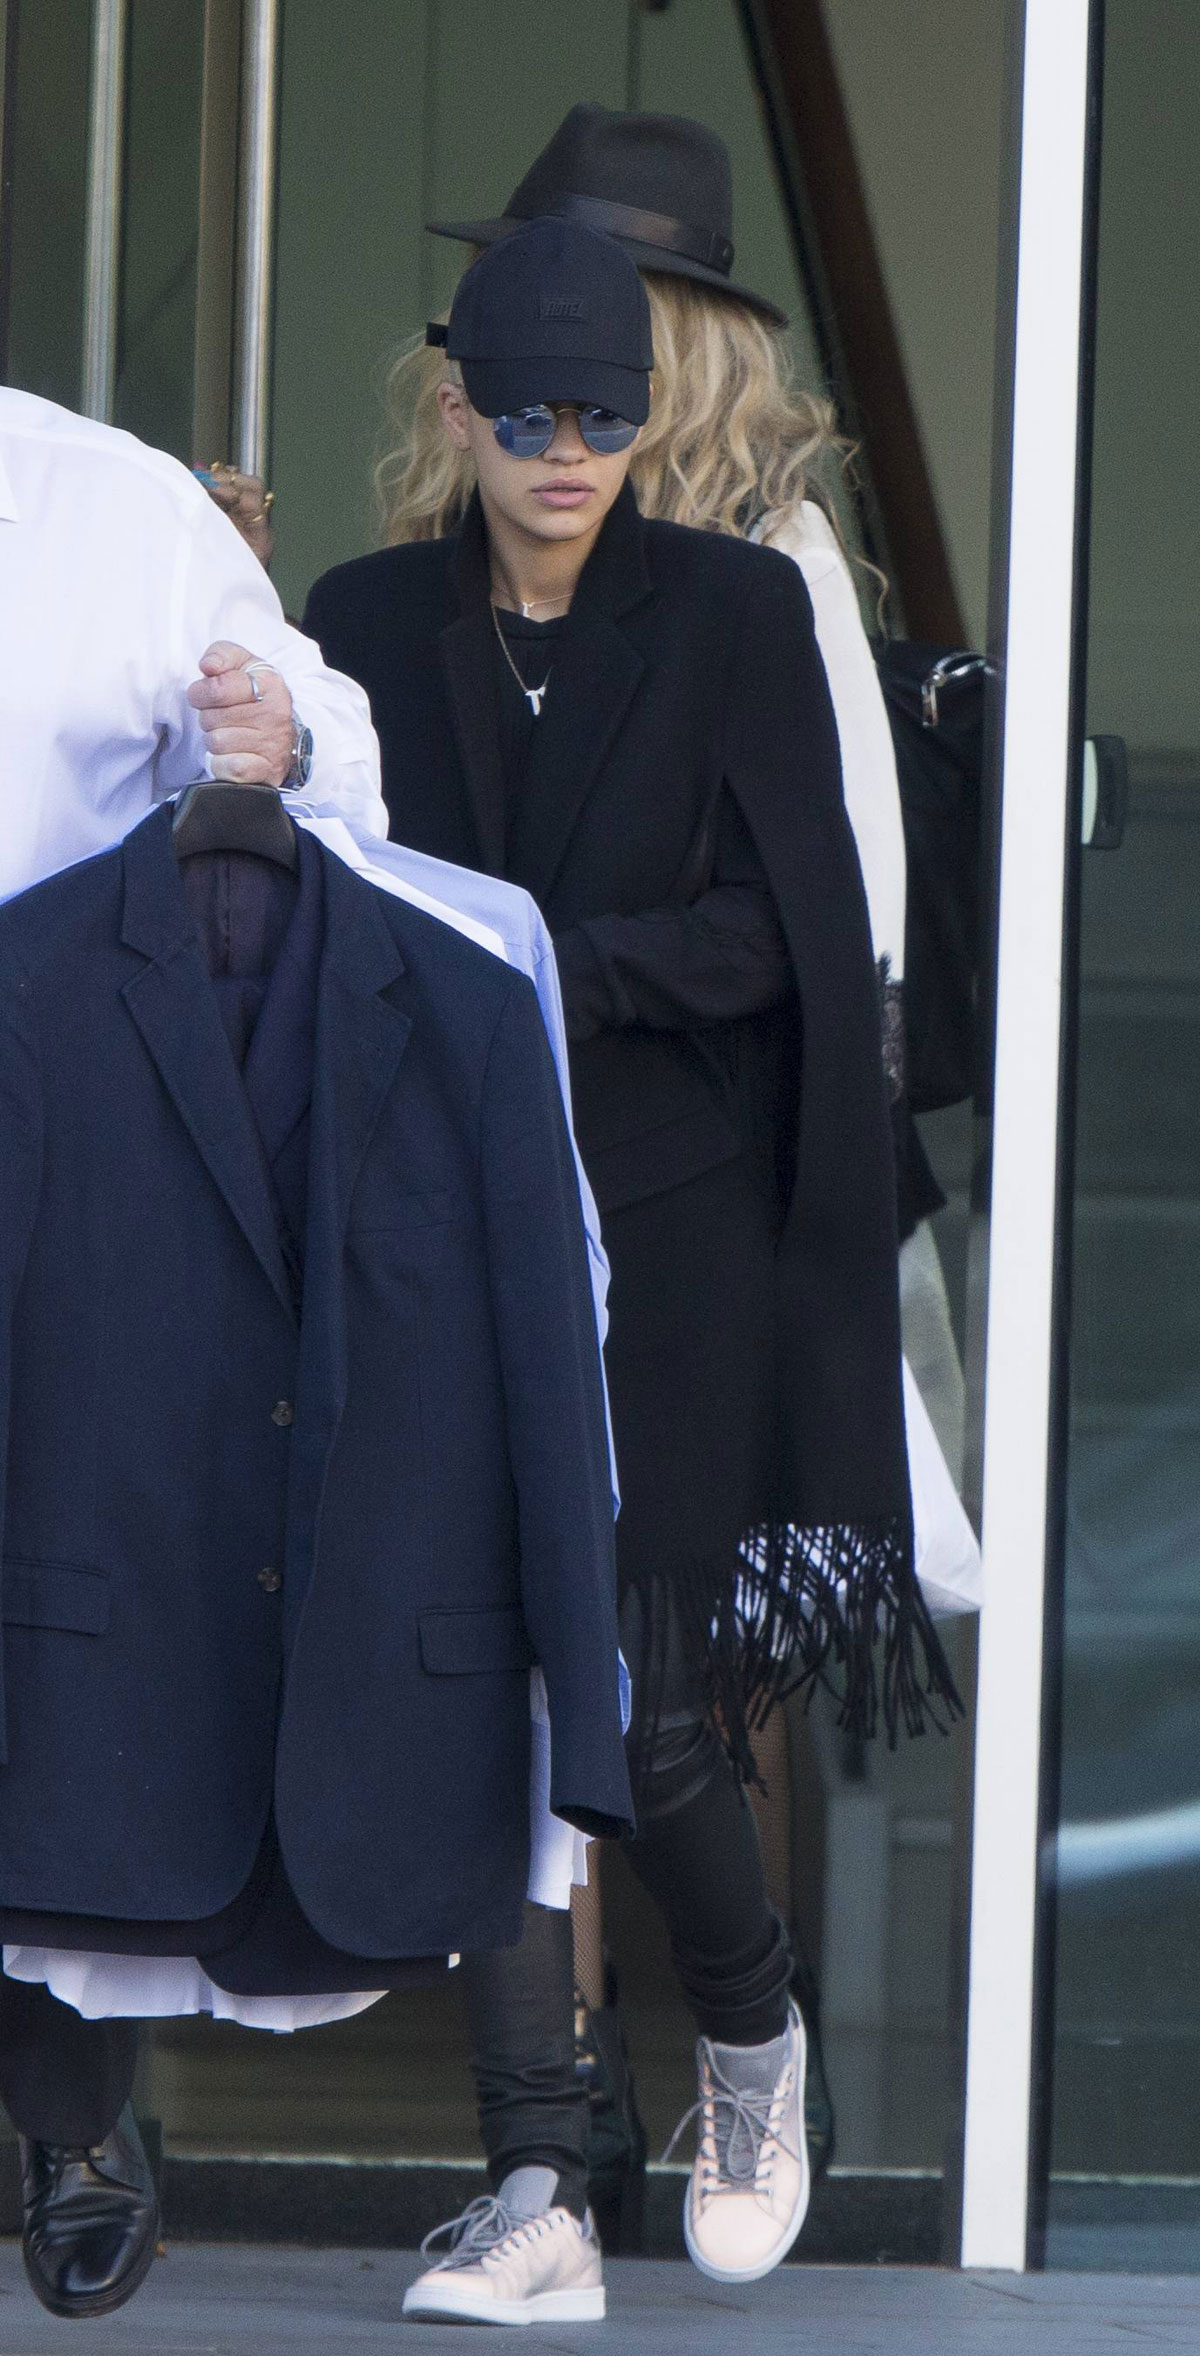 Rita Ora leaving her hotel in Manchester